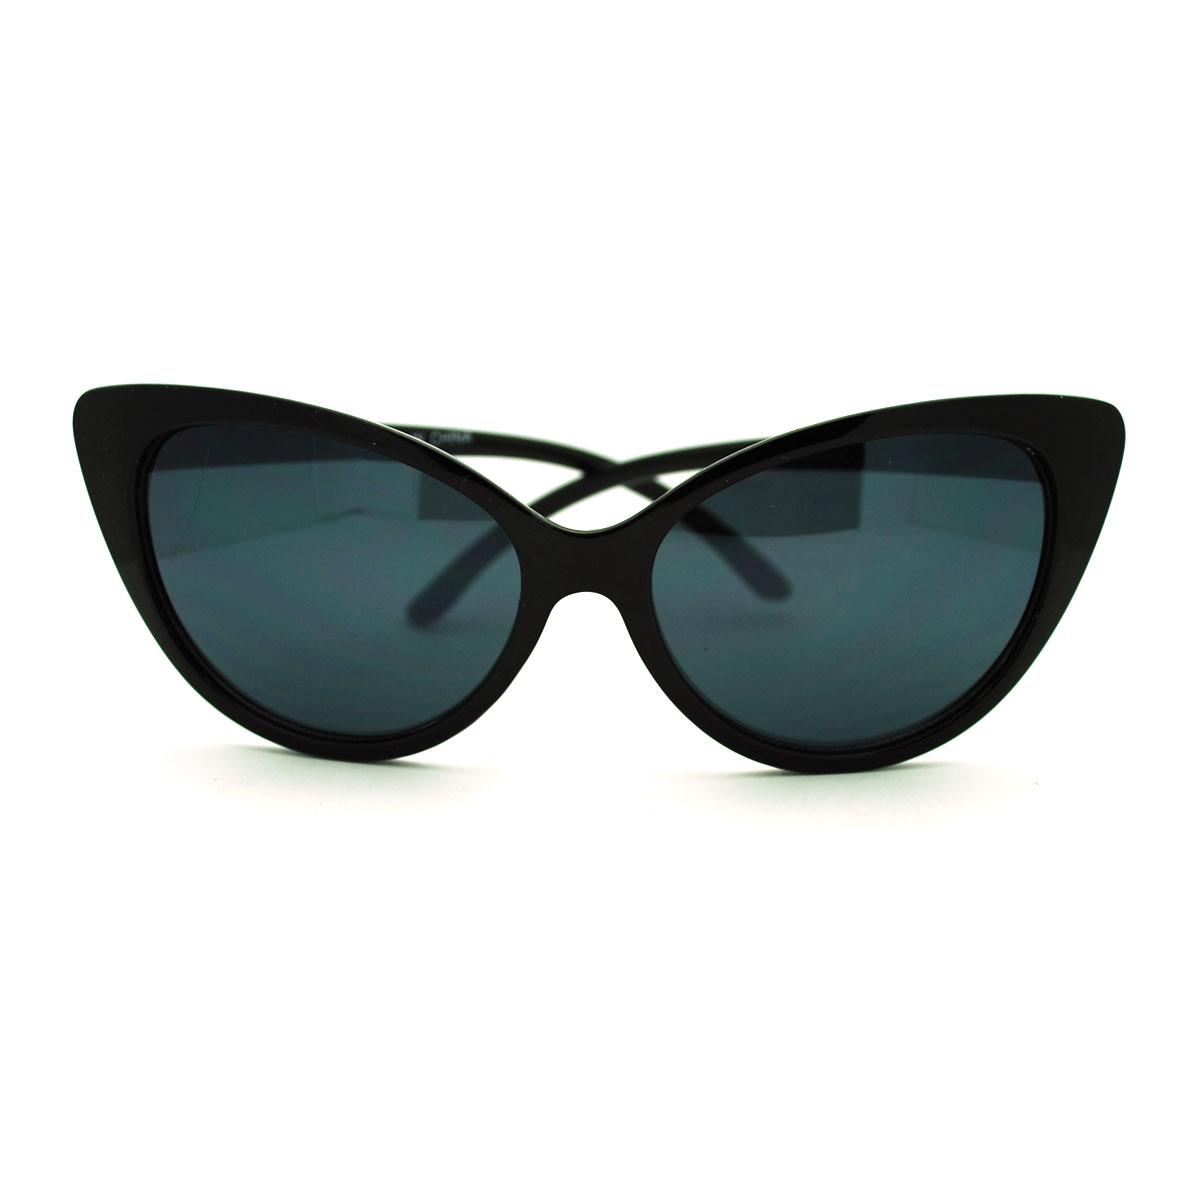 Classic Womens Sunglasses  50s style women 039 s classic cat eye sunglasses ebay